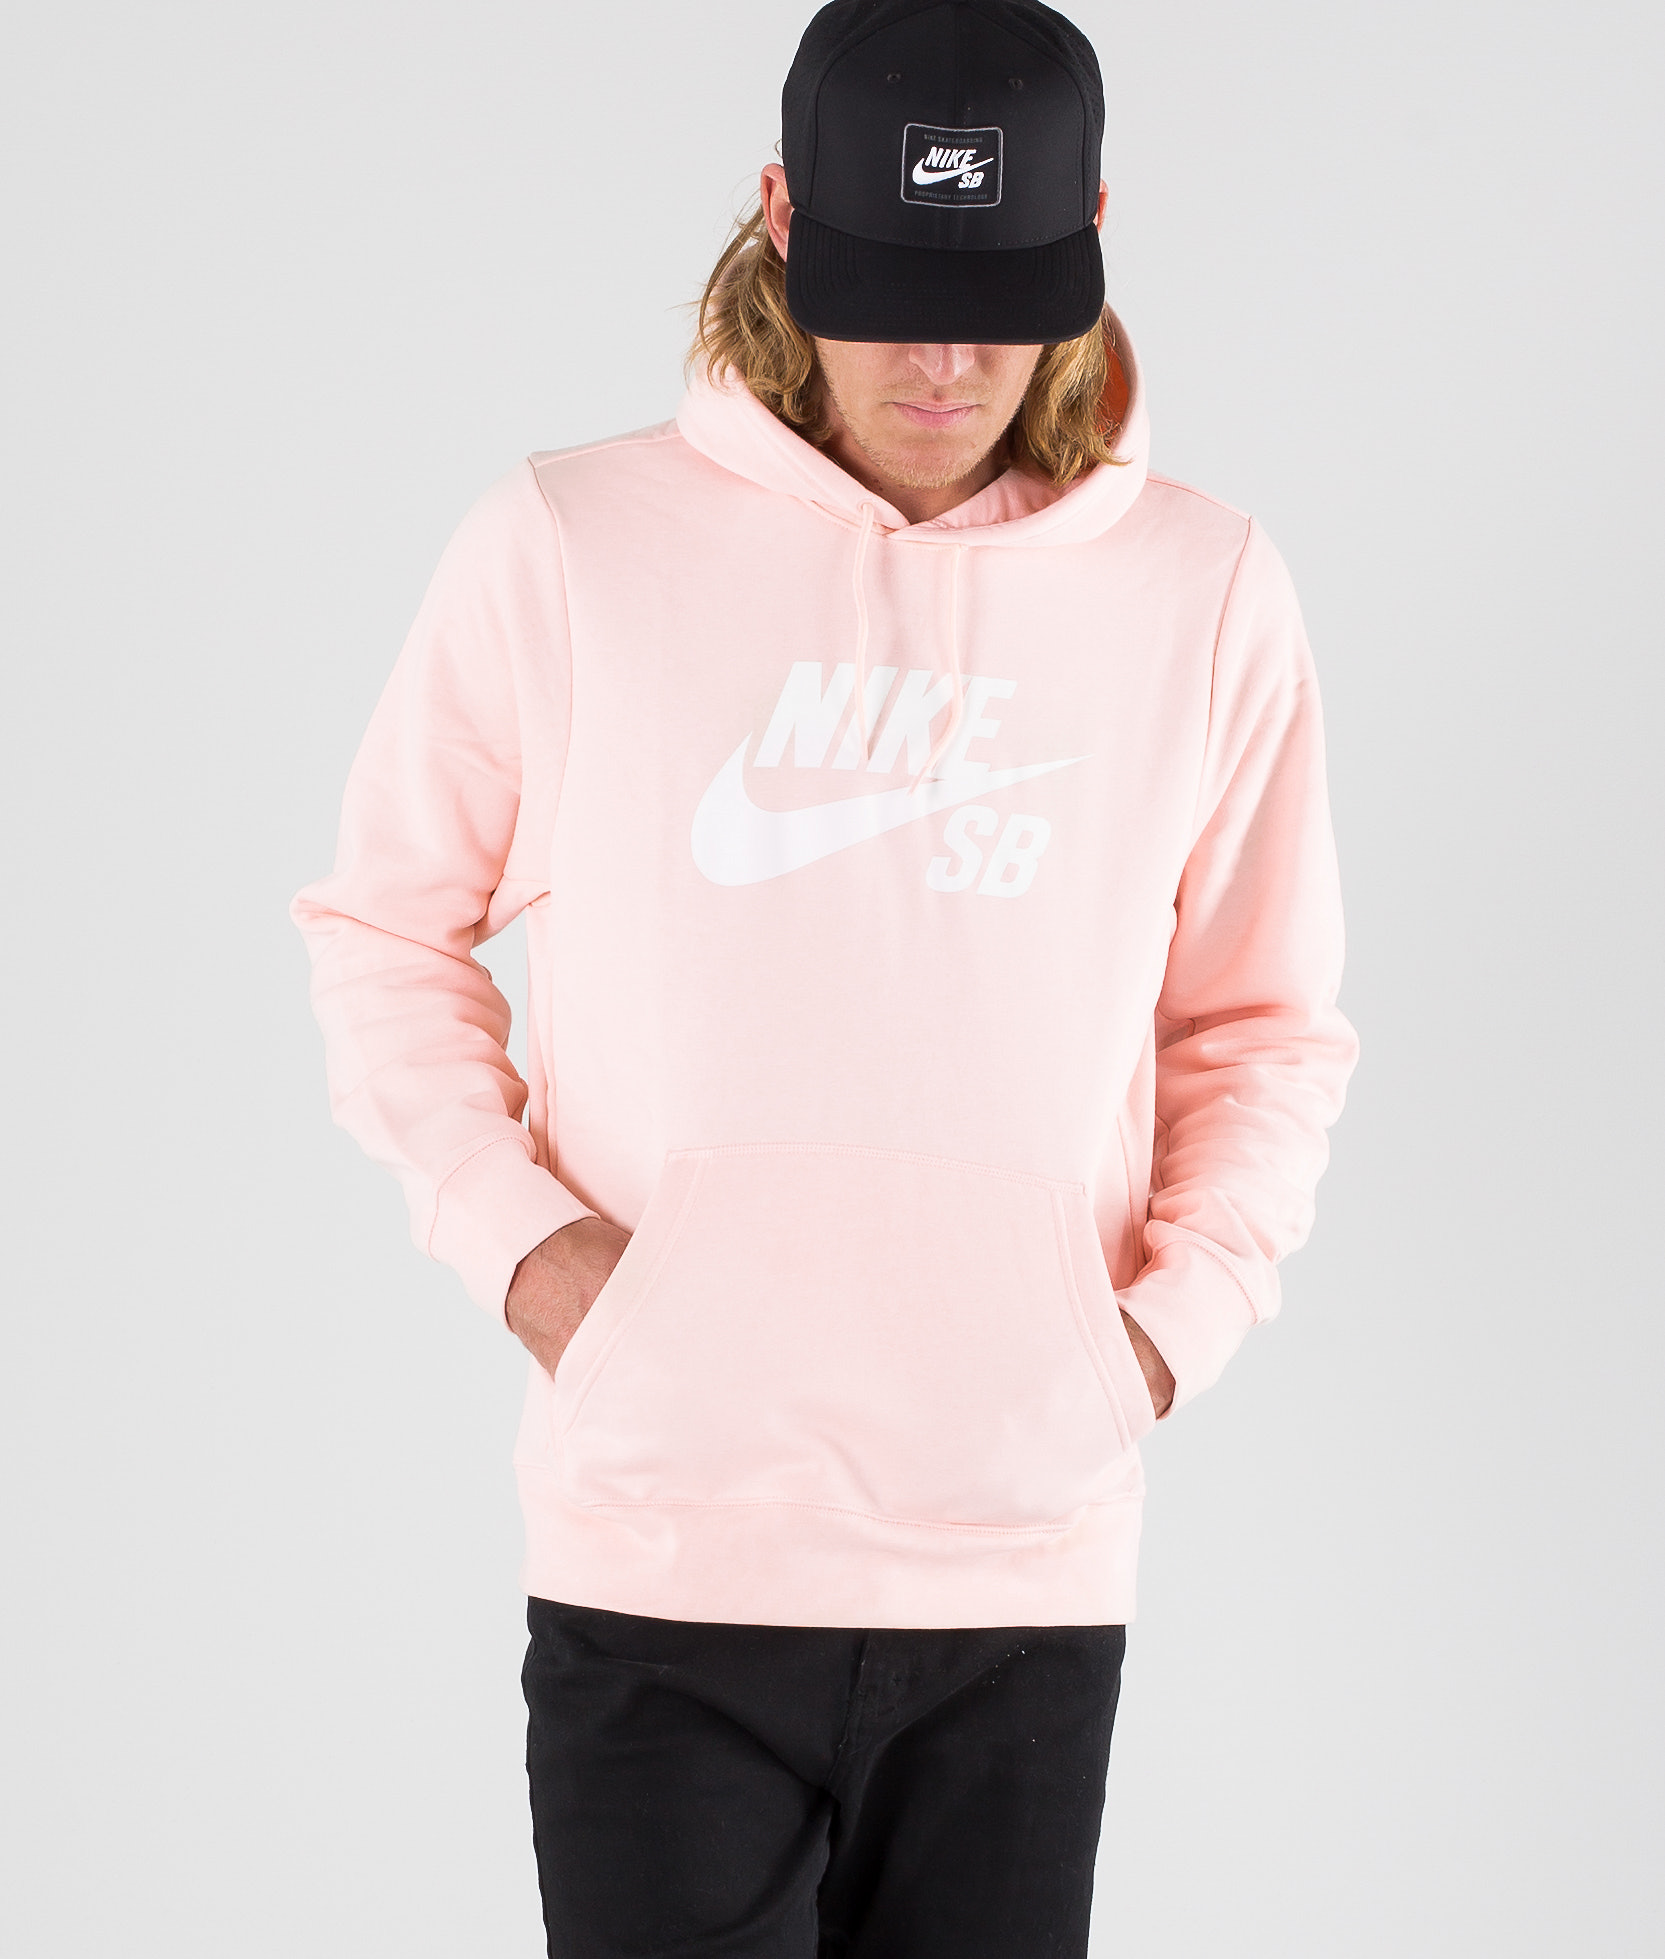 sale retailer 99e1a 293af Nike